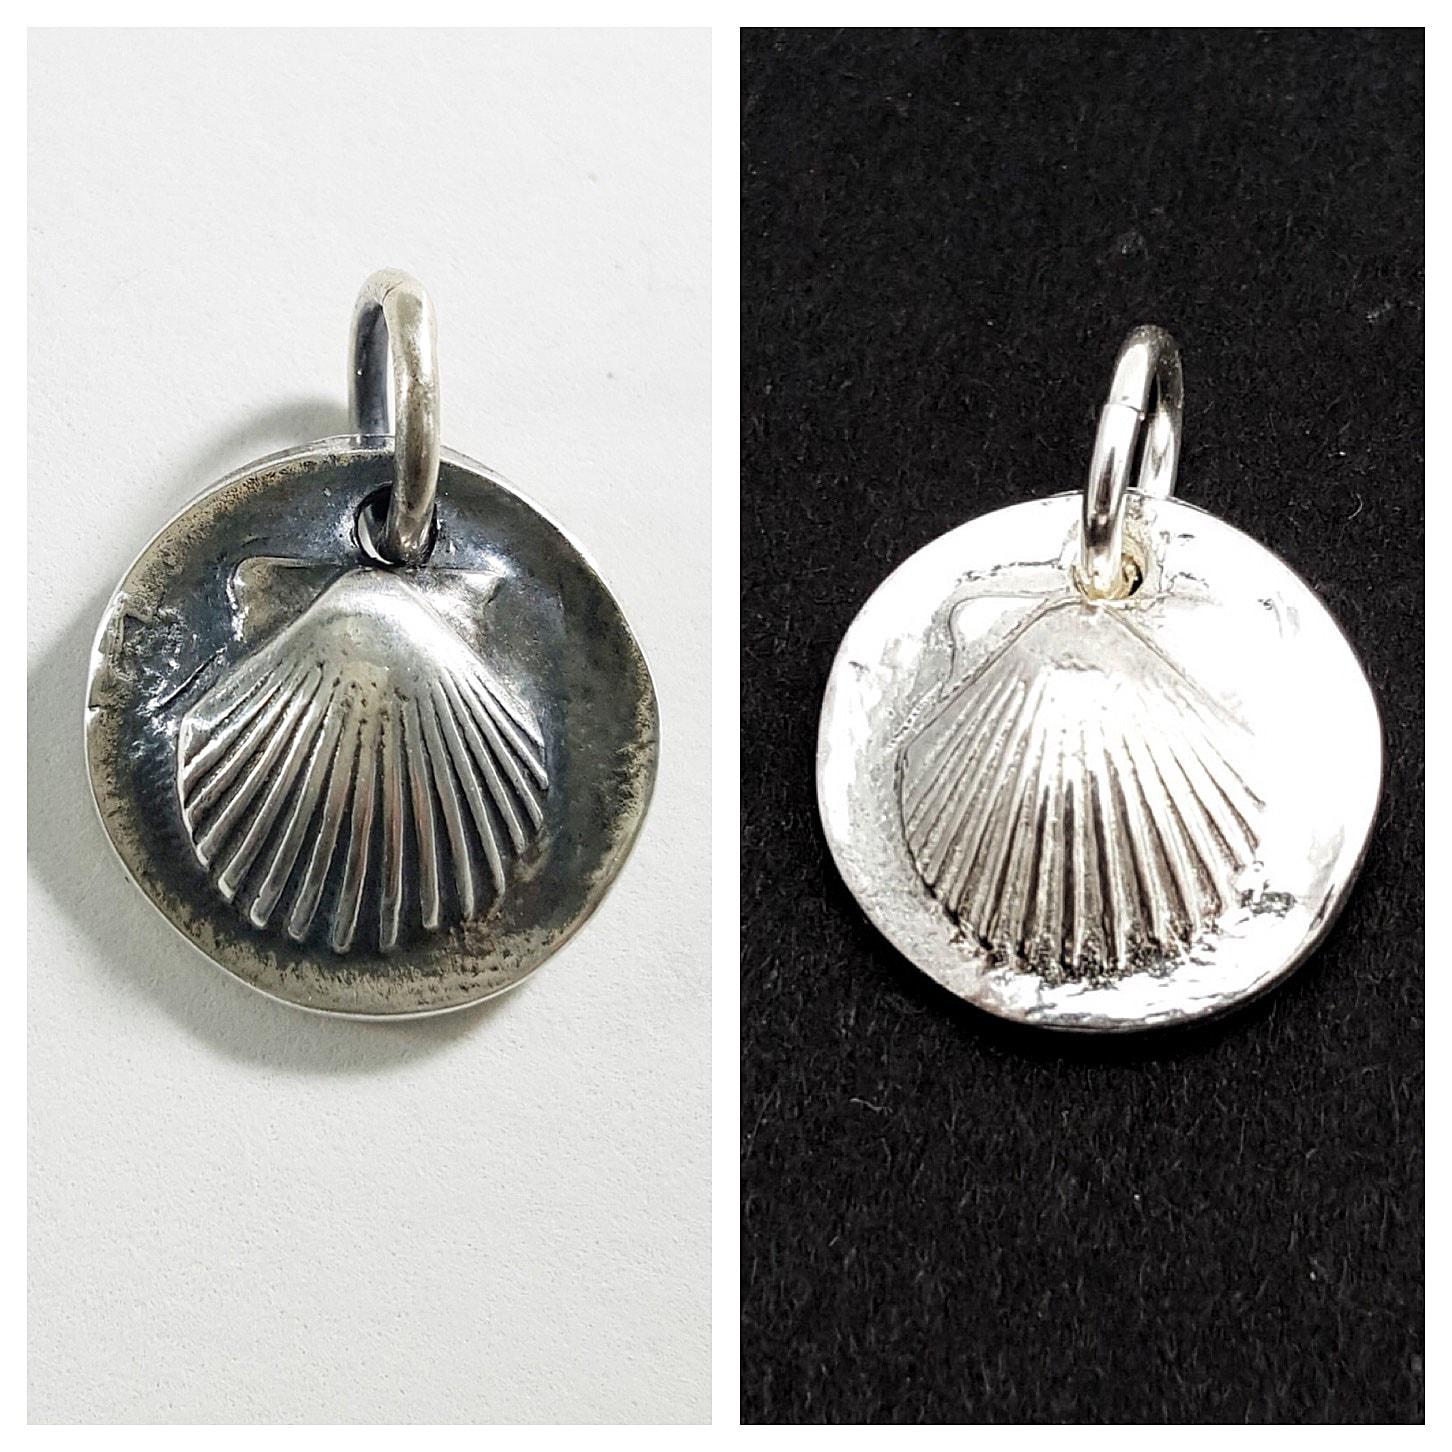 scallop-shell